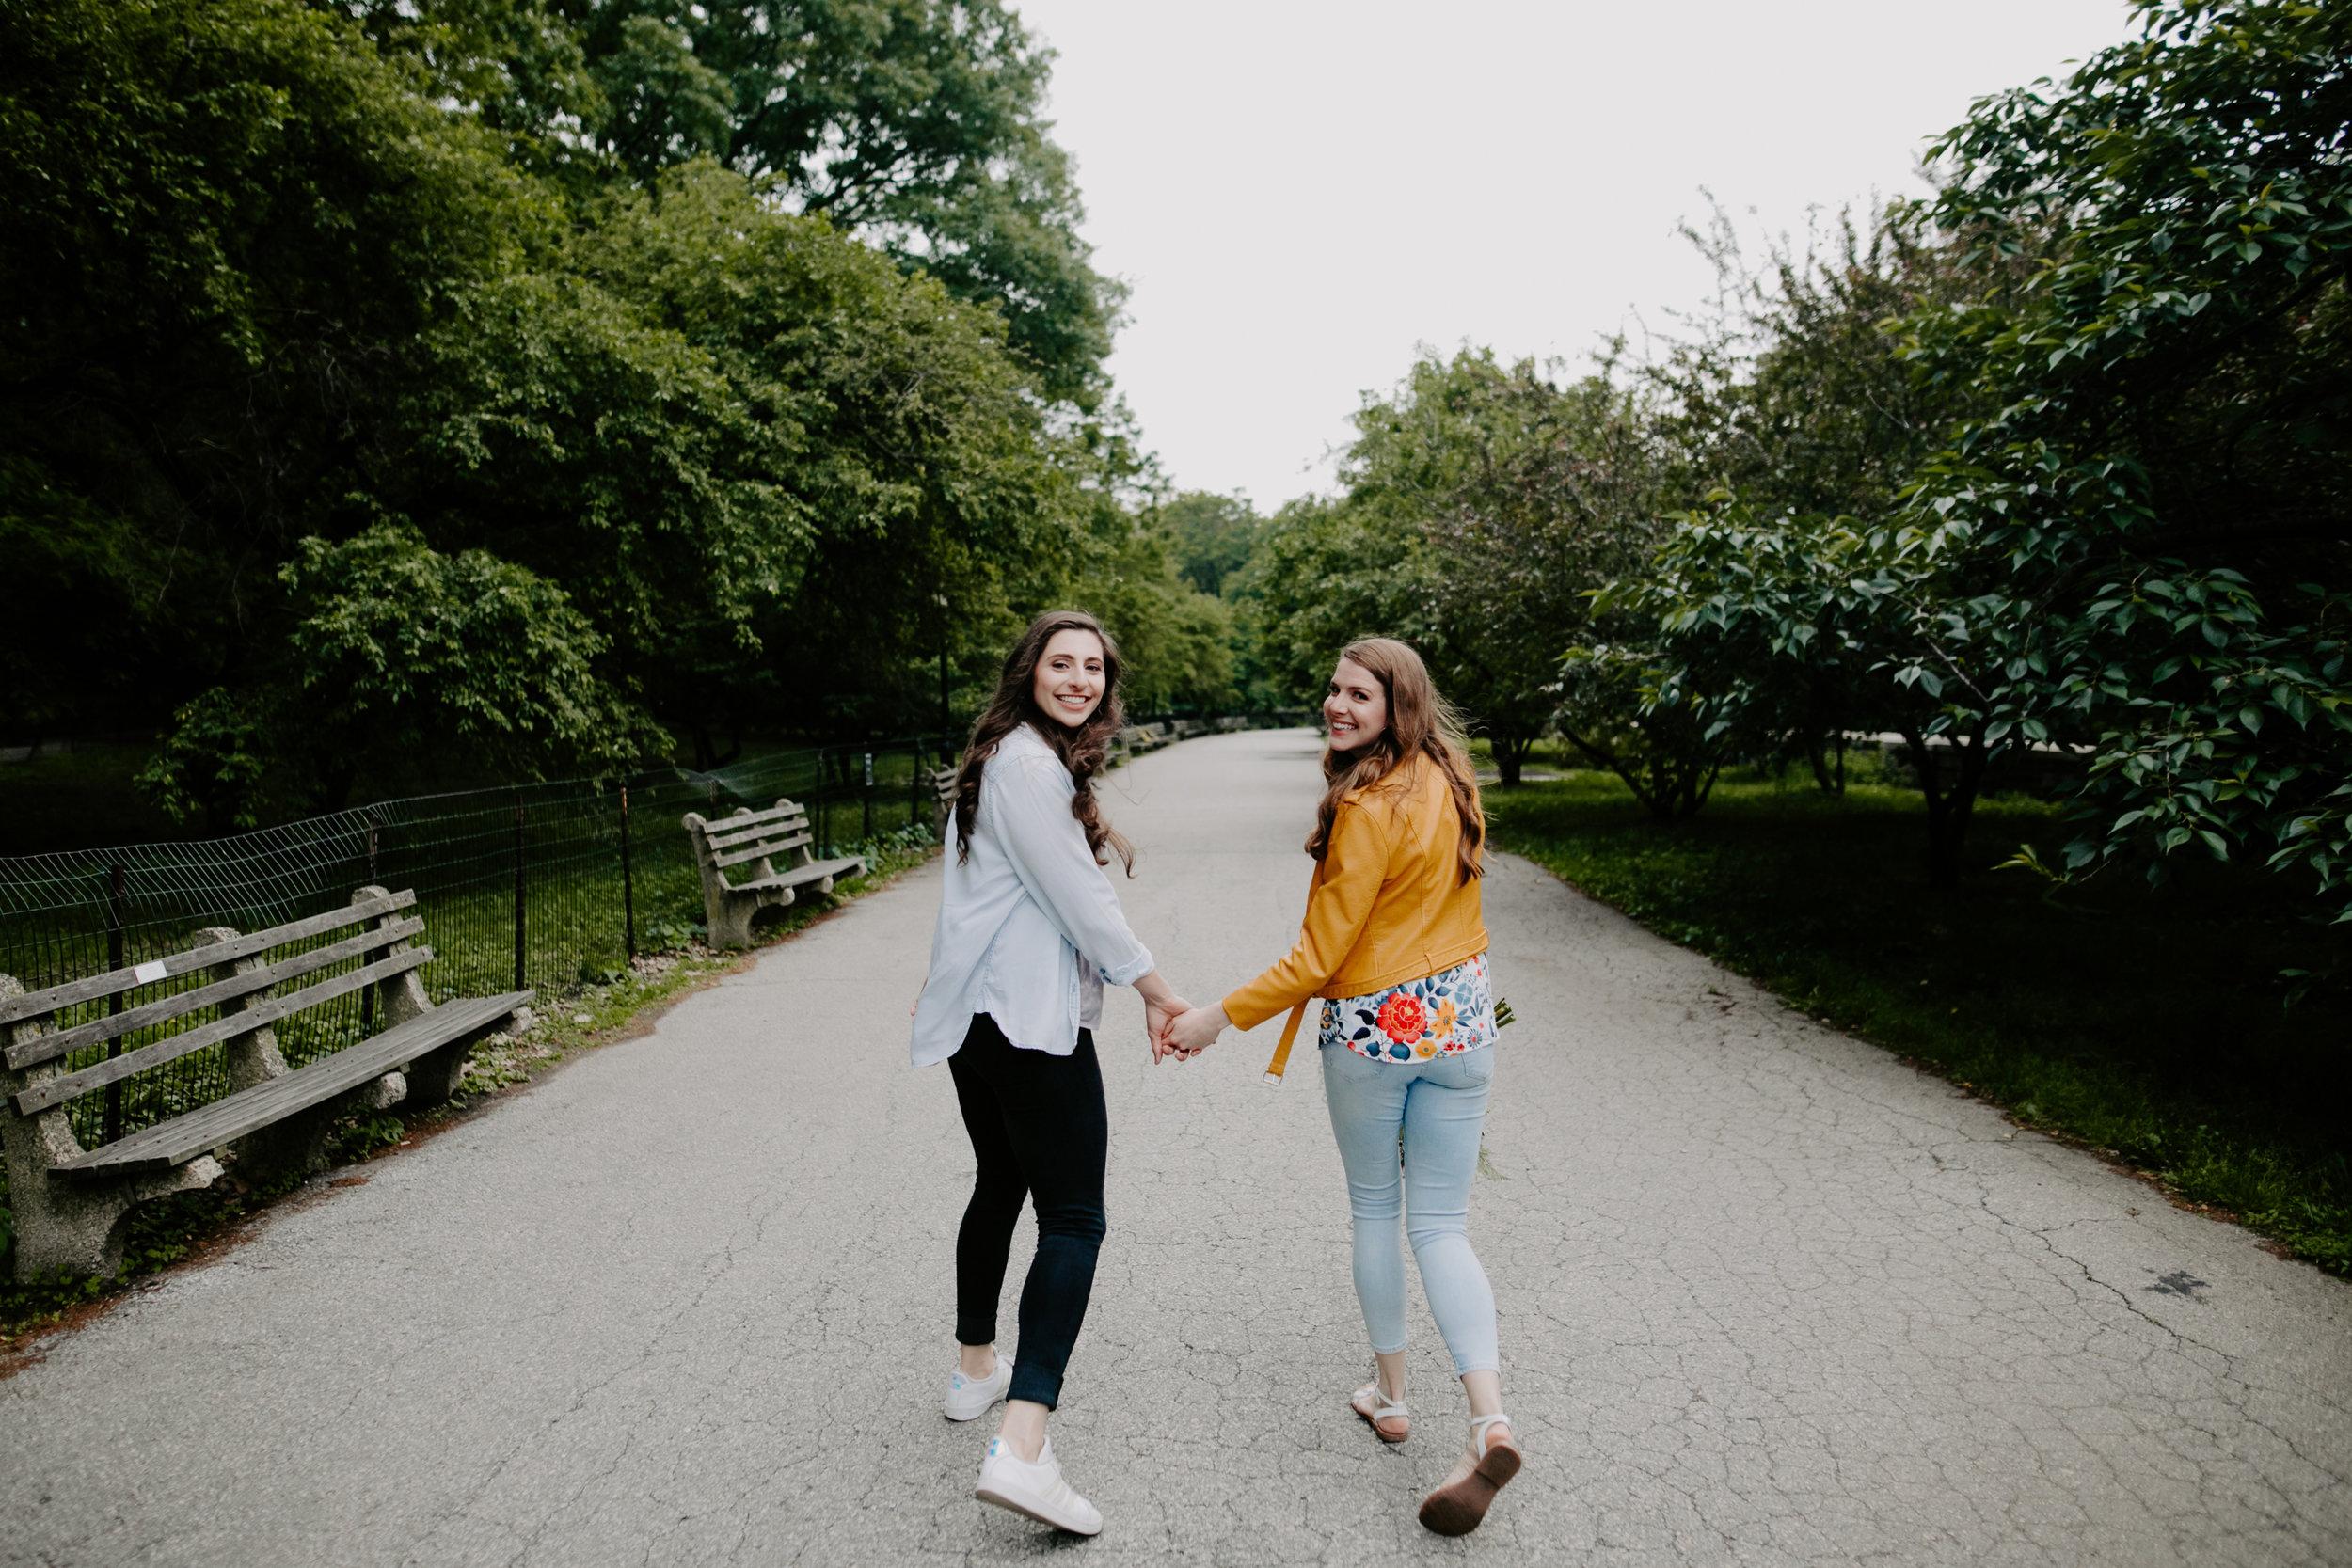 BrittanyMaggie__NYC_Engagement_TowardsTheMoon-20.jpg